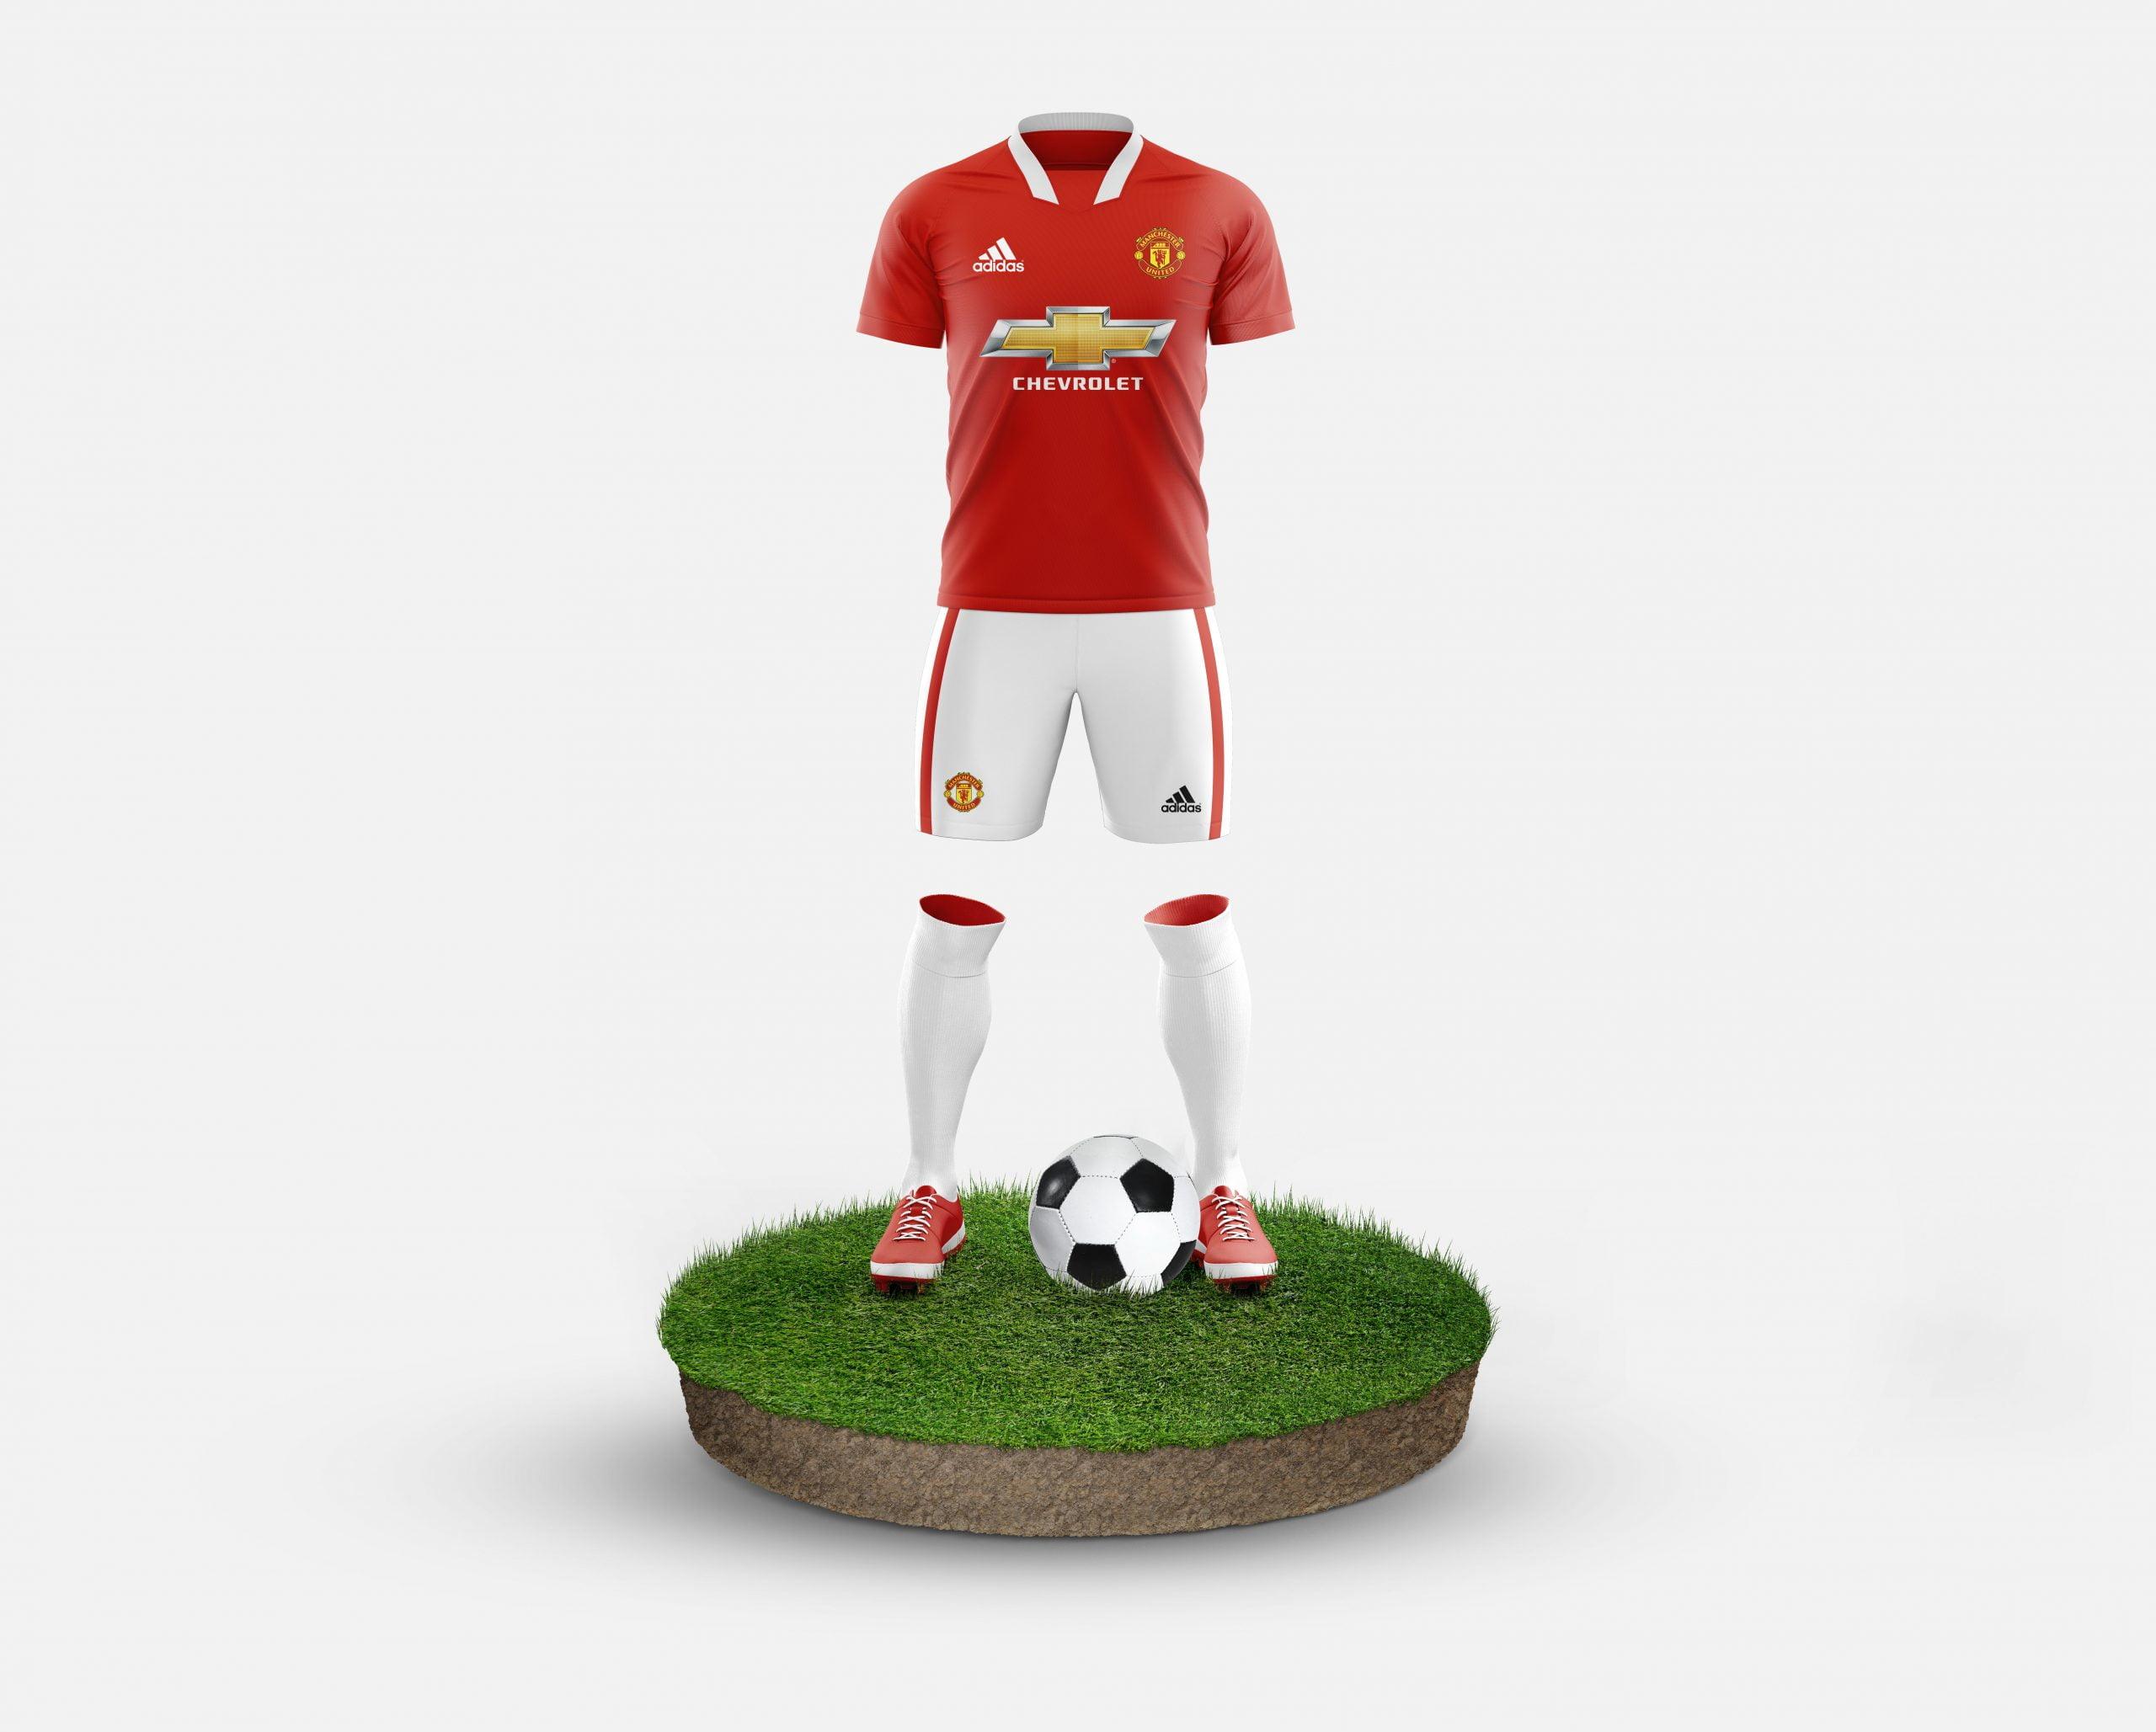 Manchester United Free Football Kit Mockup Template